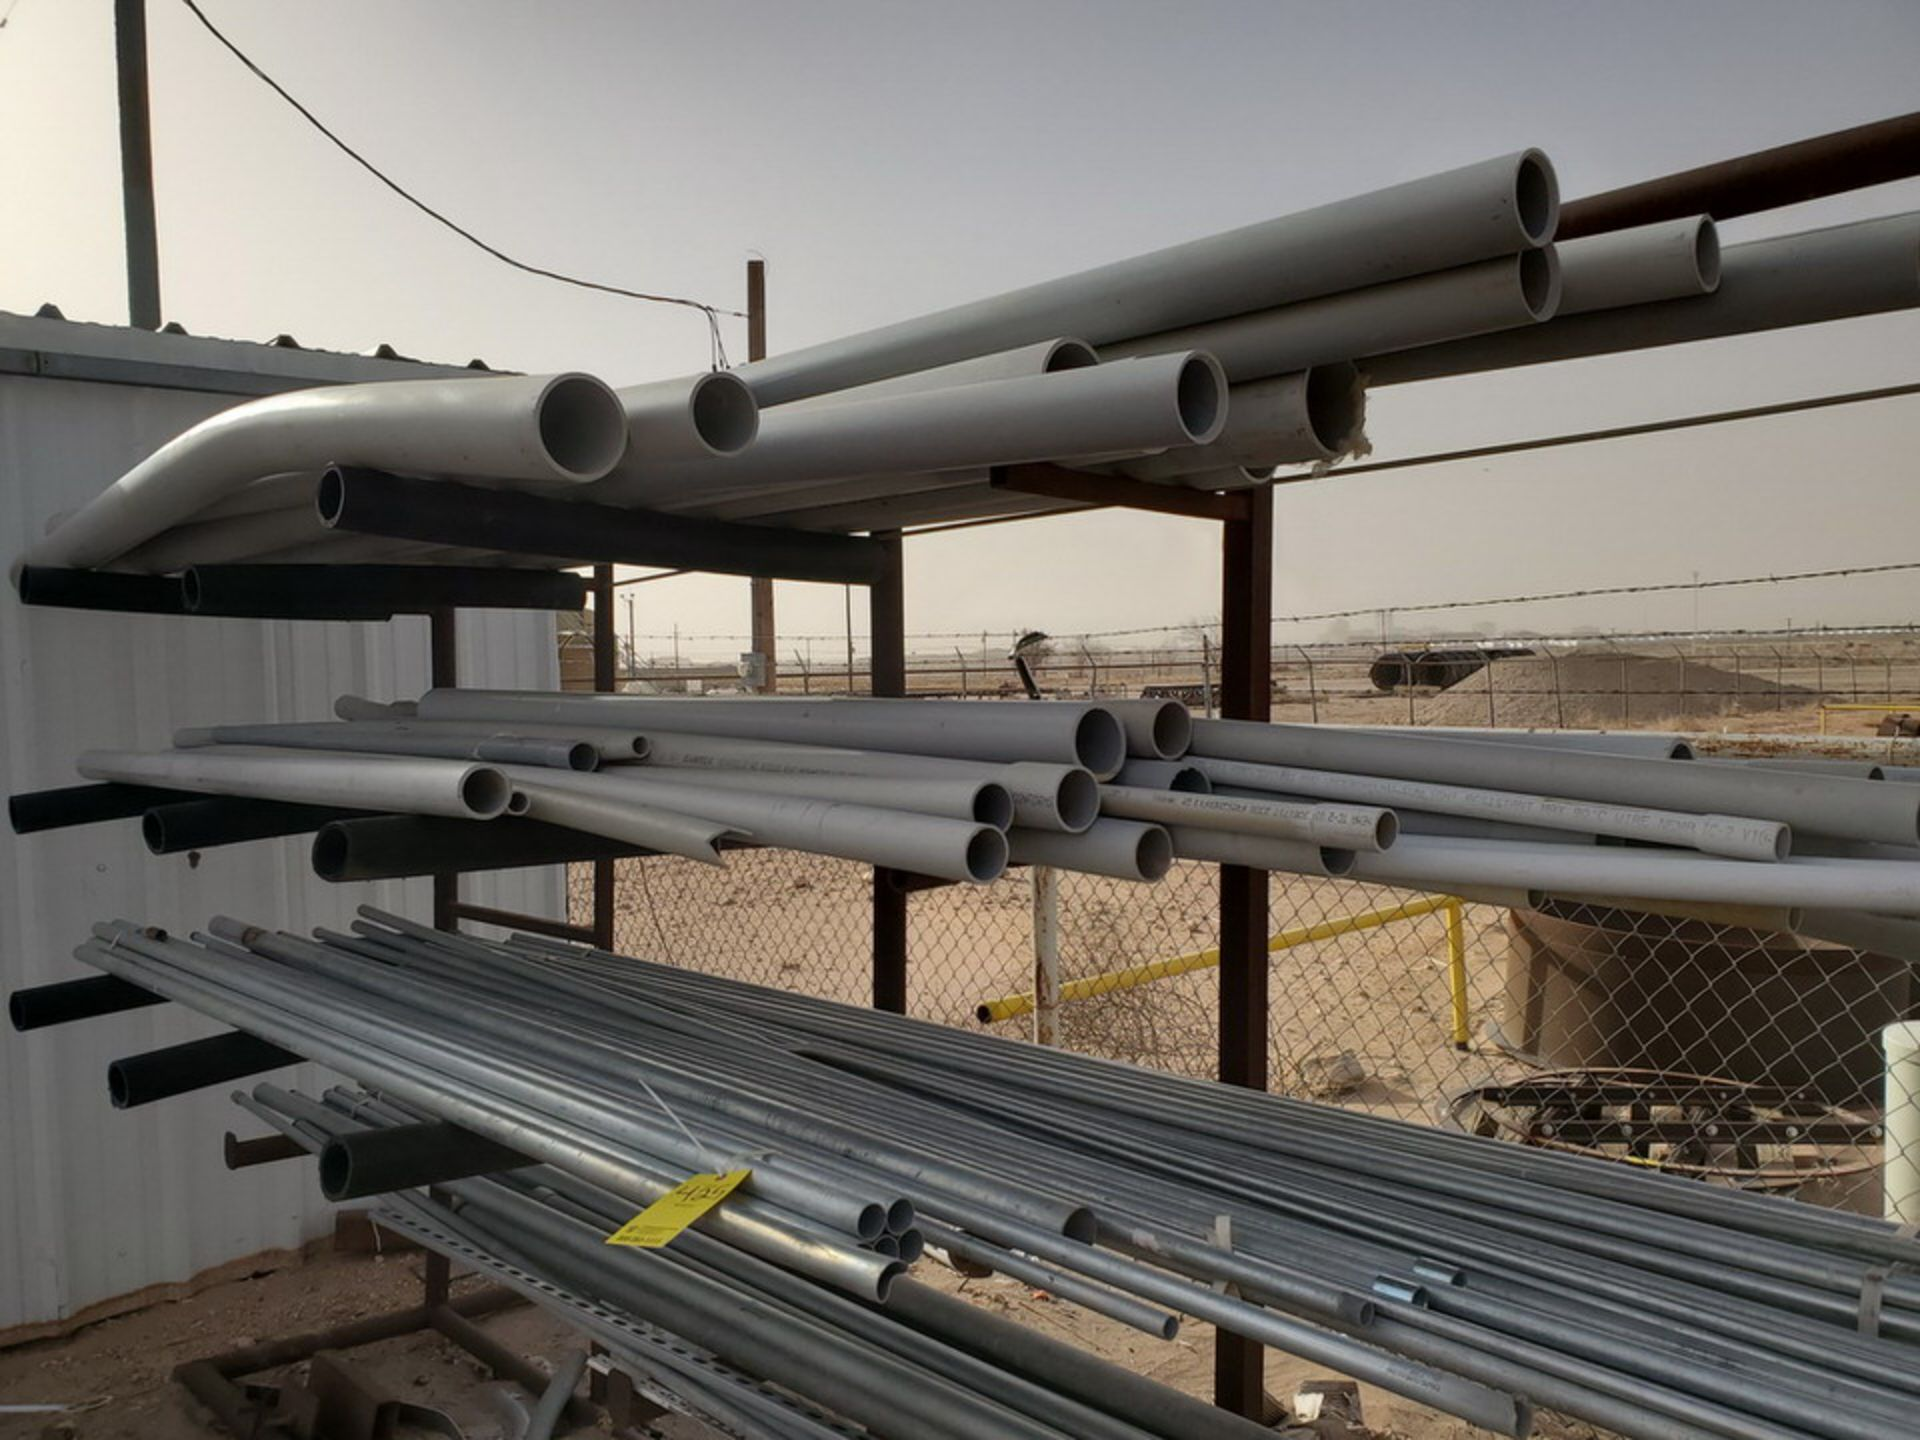 "PVC & Alum. Pipe W/ Conduit Size Range: 1/2"" - 4"" W/ Rack - Image 8 of 18"